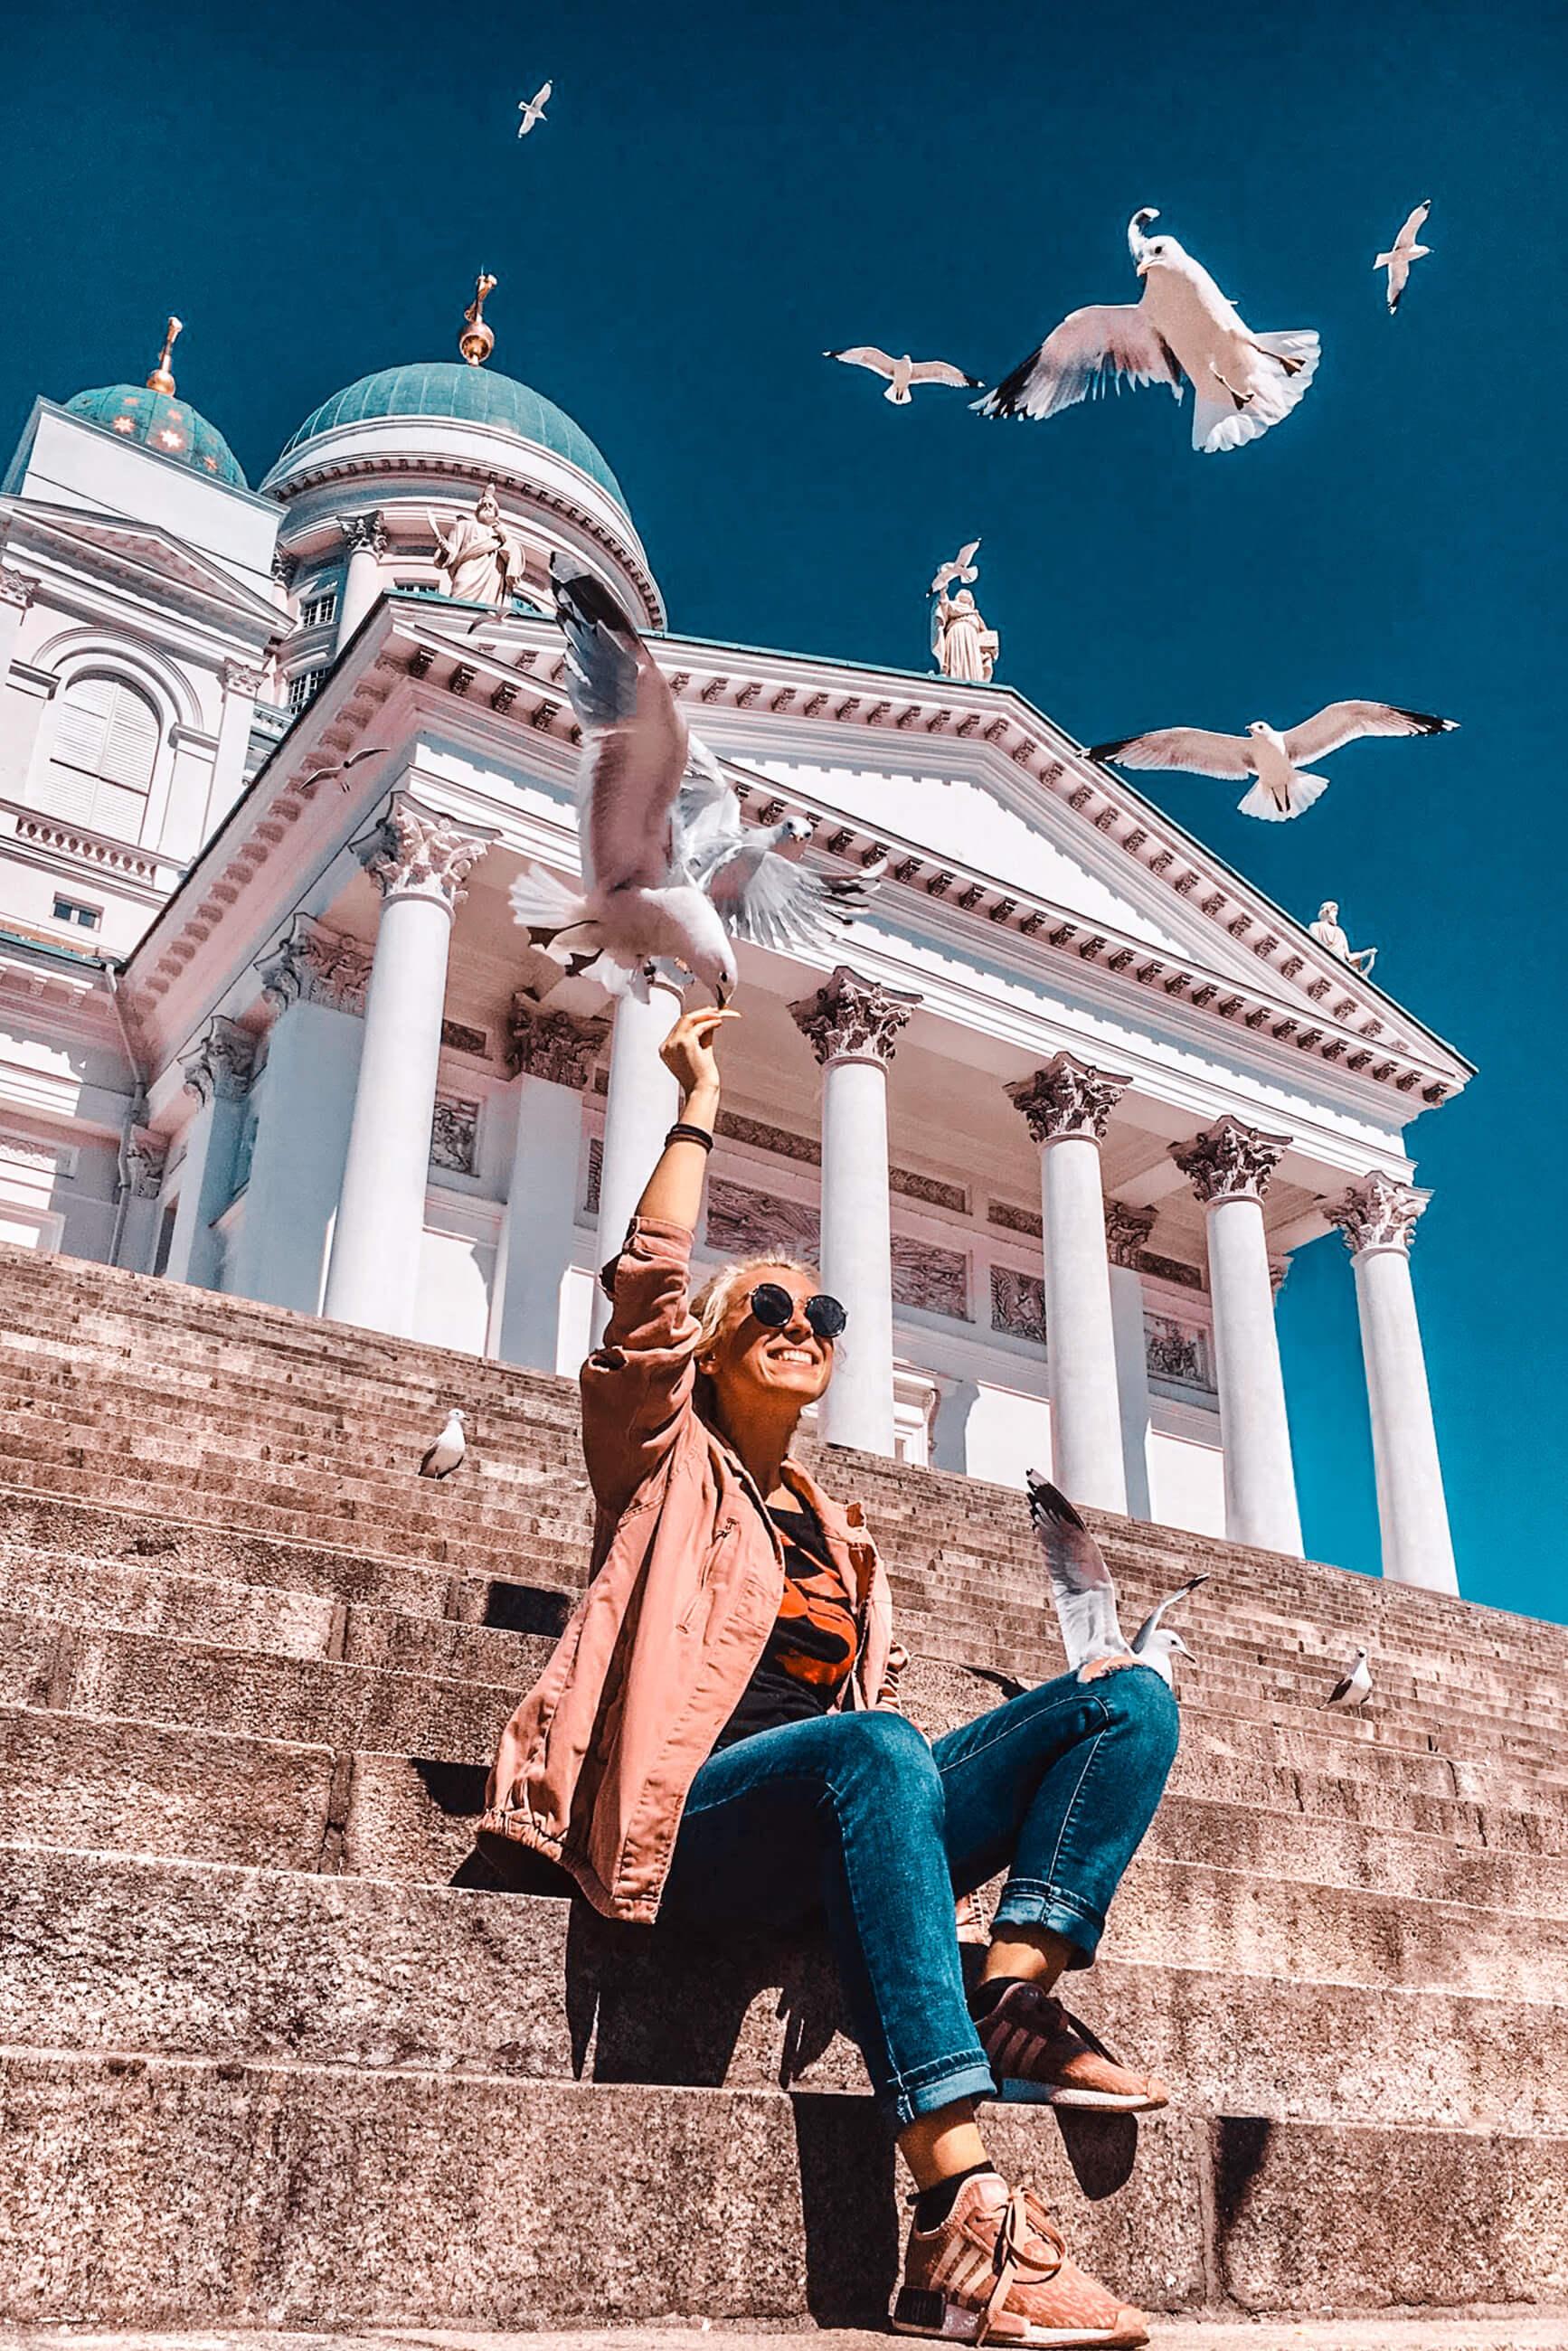 https://bubo.sk/uploads/galleries/5045/zuzkahabekova_finsko_helsinki-66.jpg